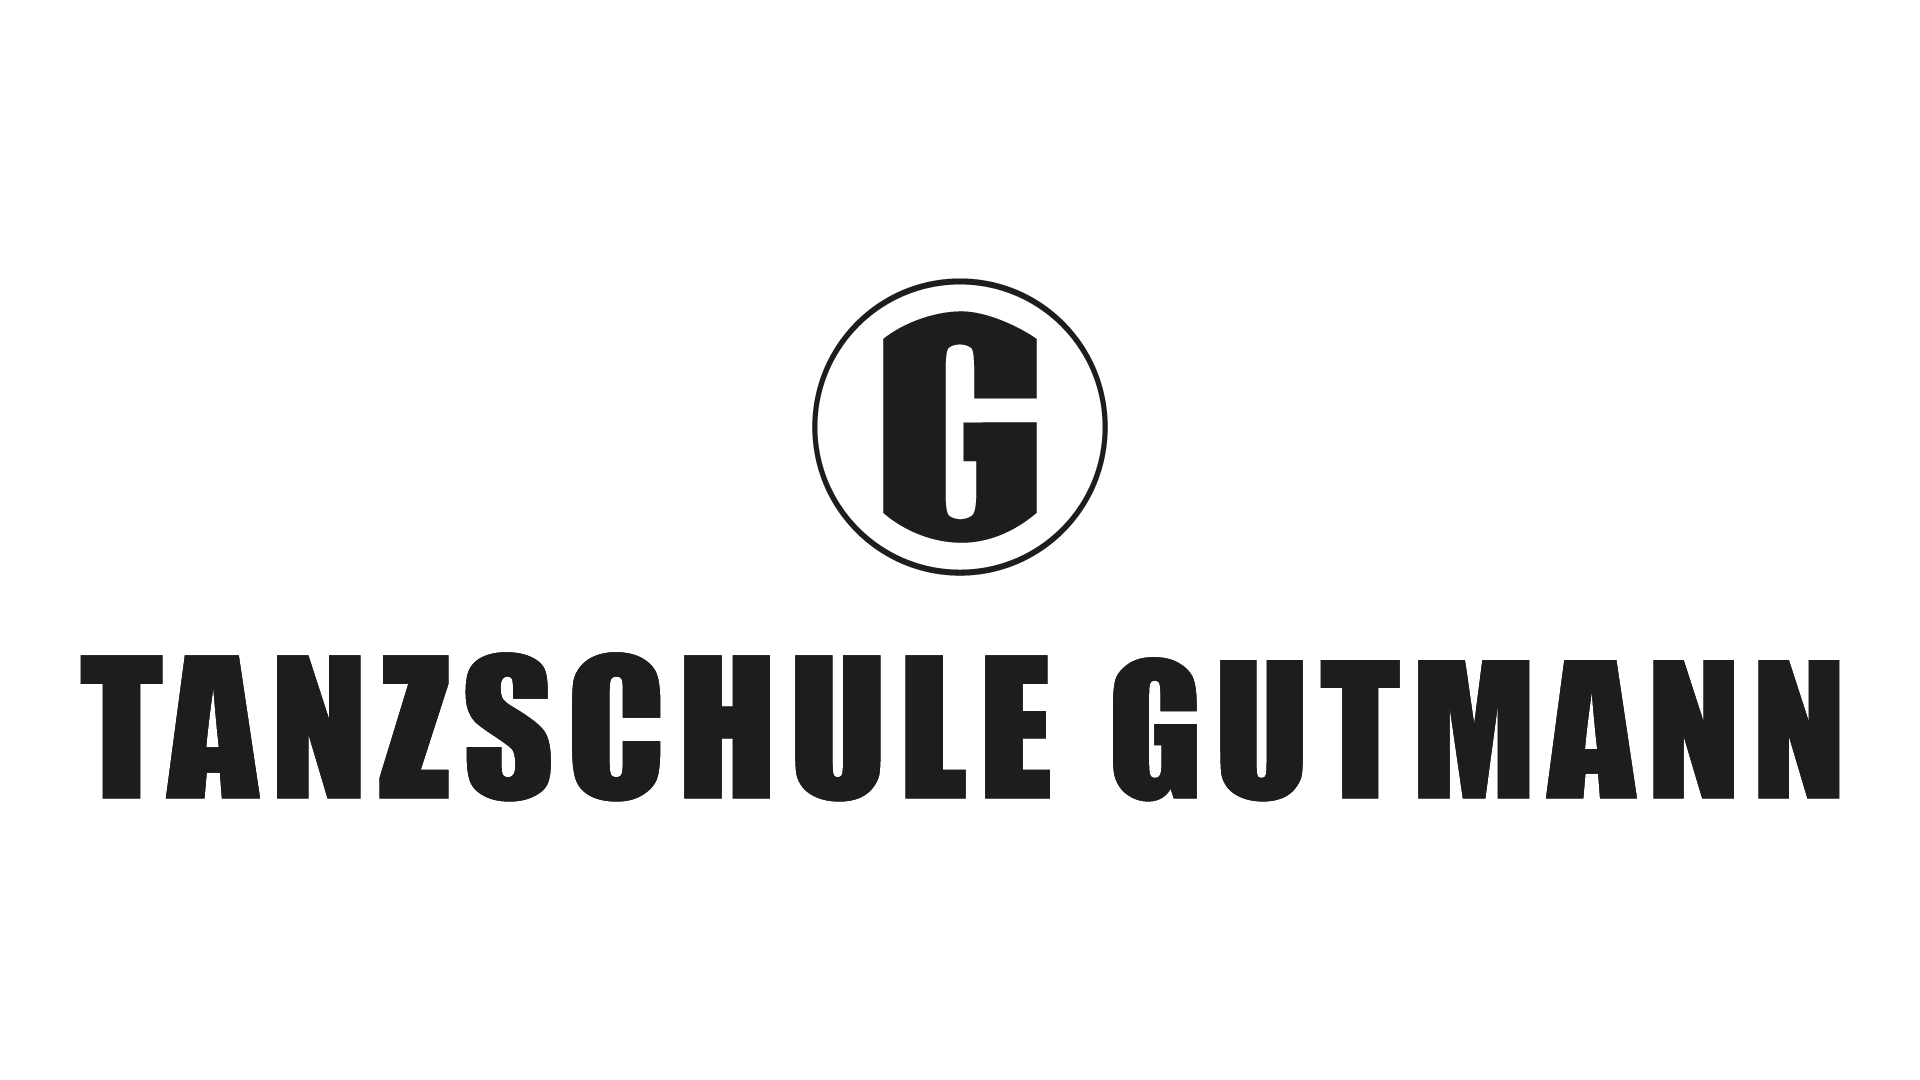 Tanzschule Gutmann Logo Schwarz 01